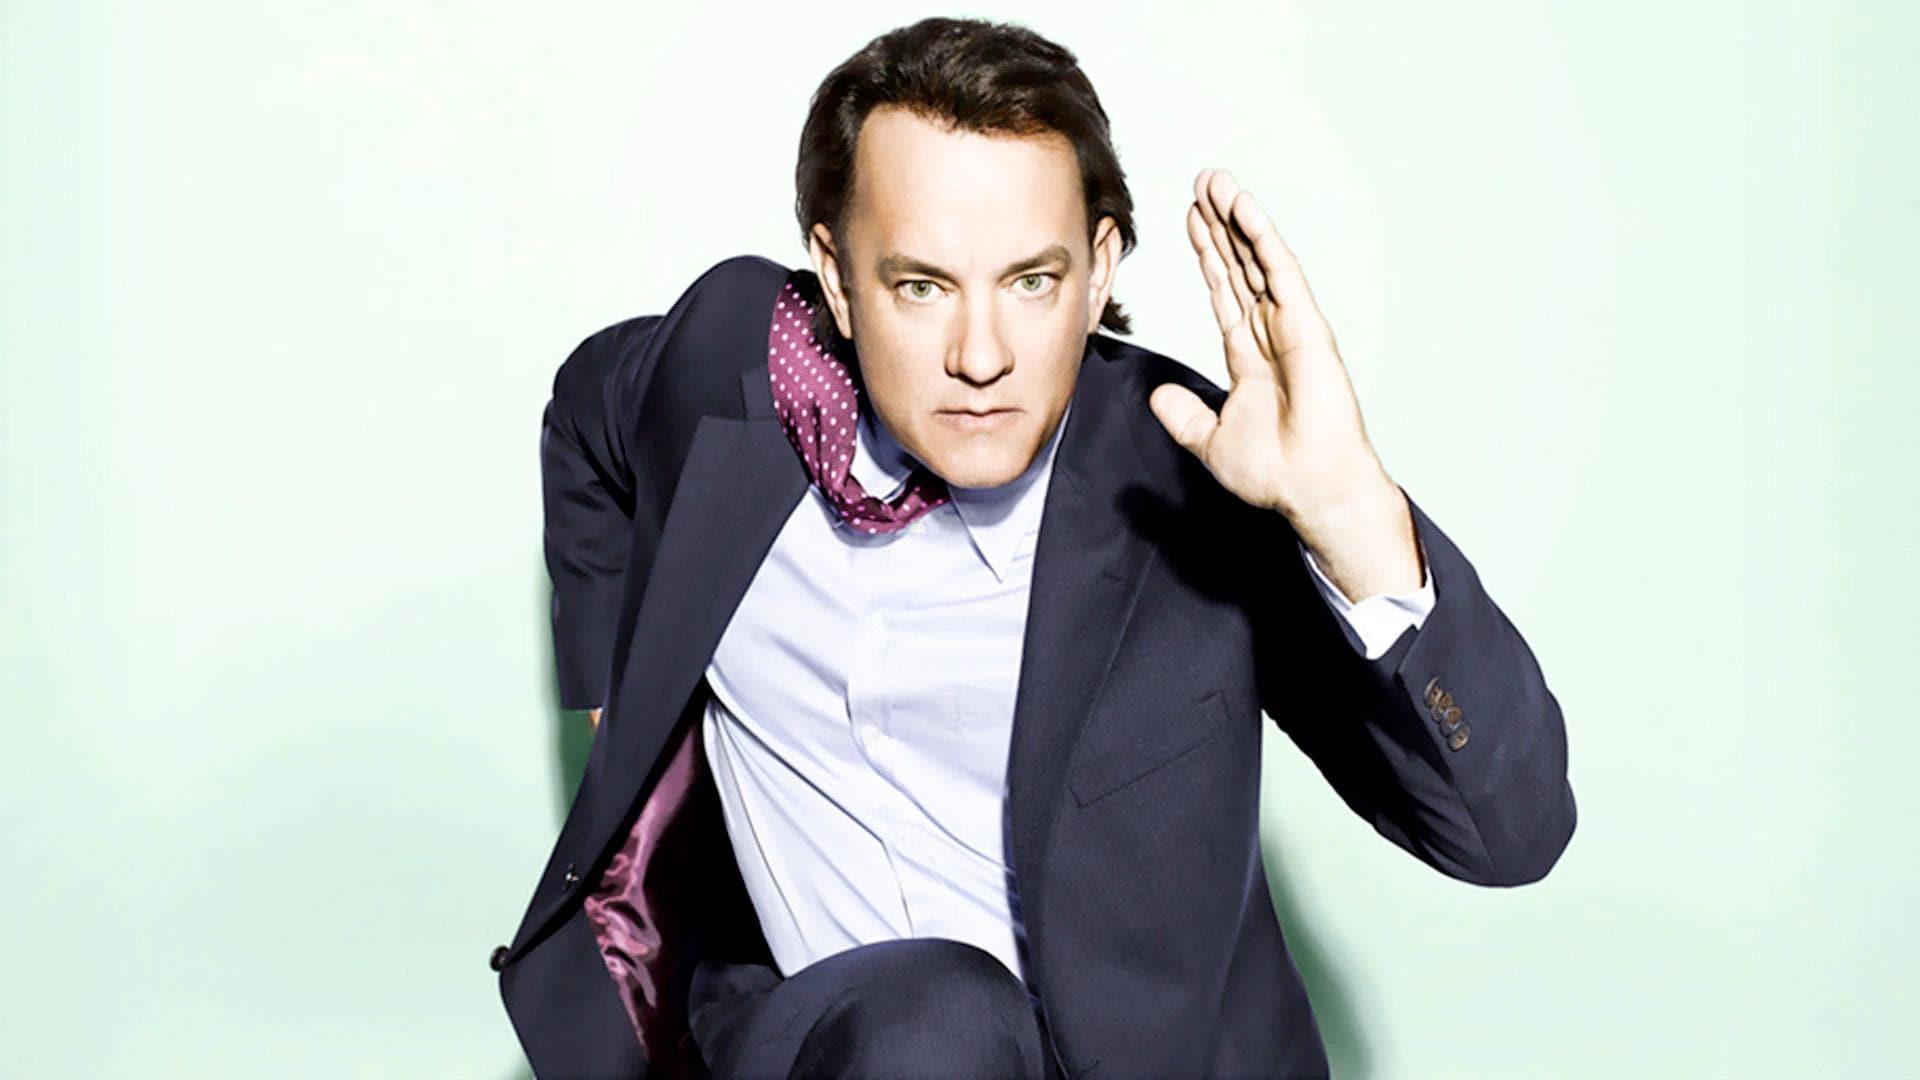 Tom Hanks: May 6, 2006